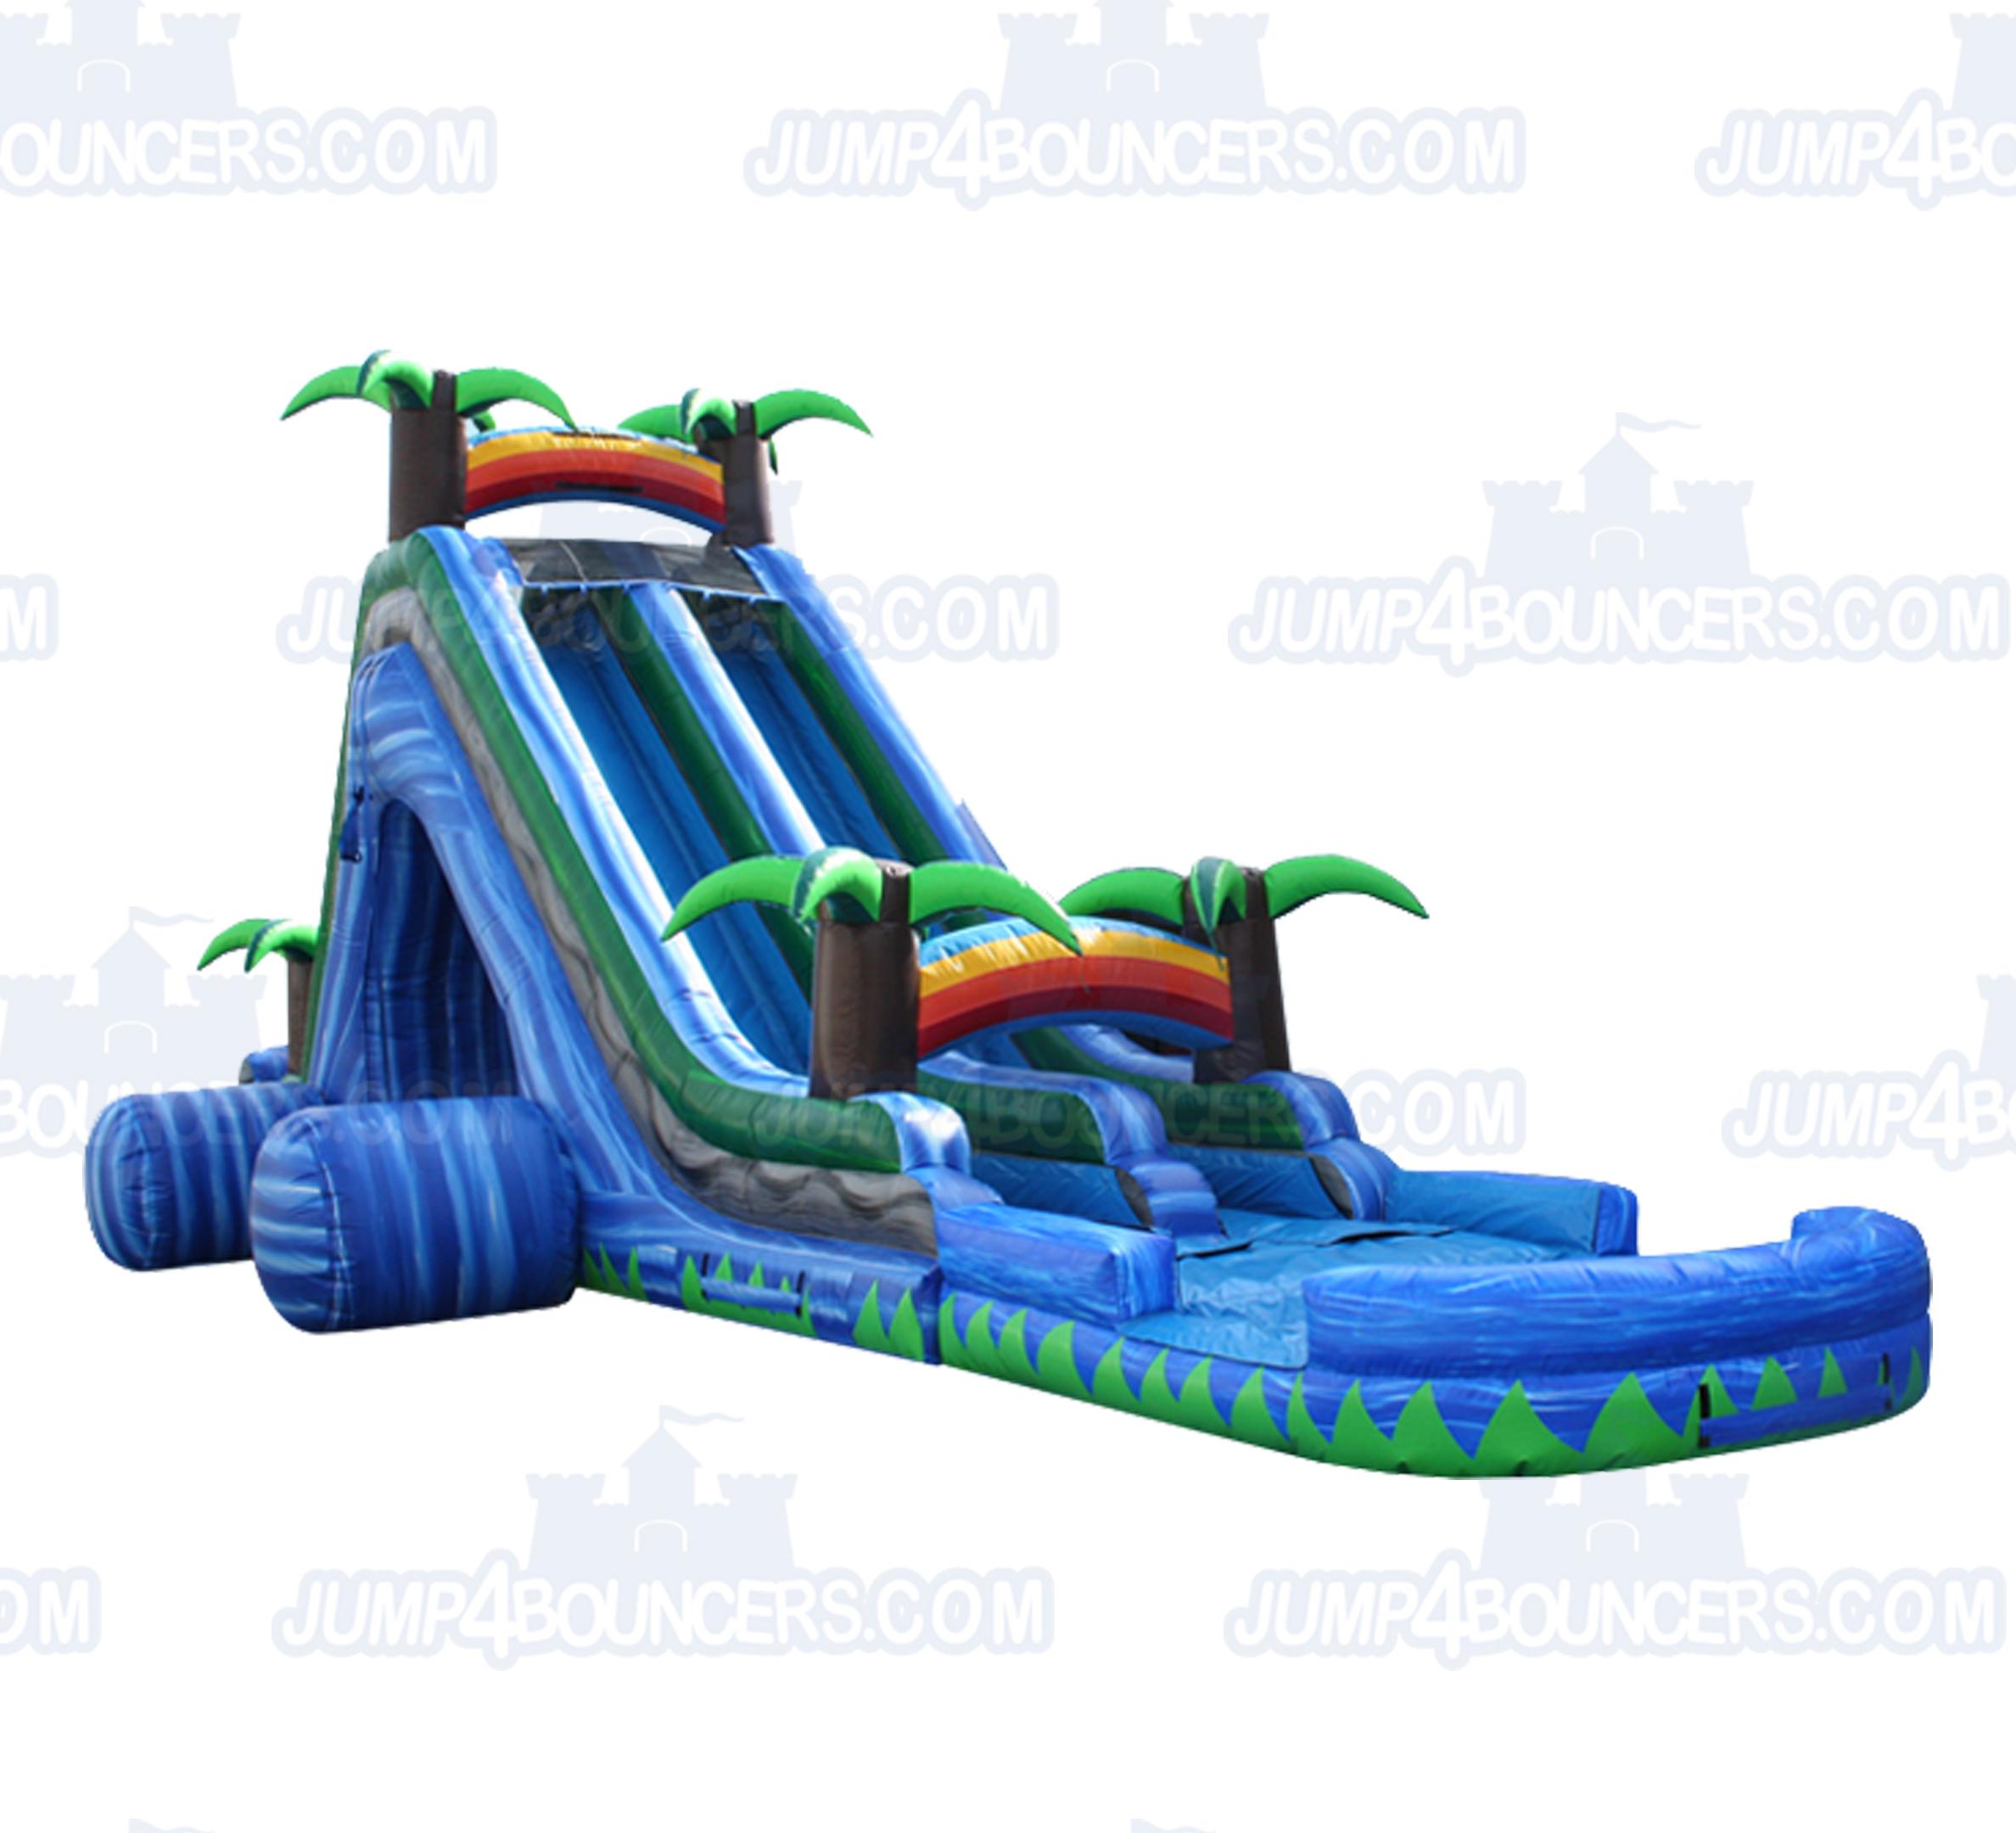 Inflatable Slide Rental Prices: WS3231 24′ Tropical Lava WaterSlide